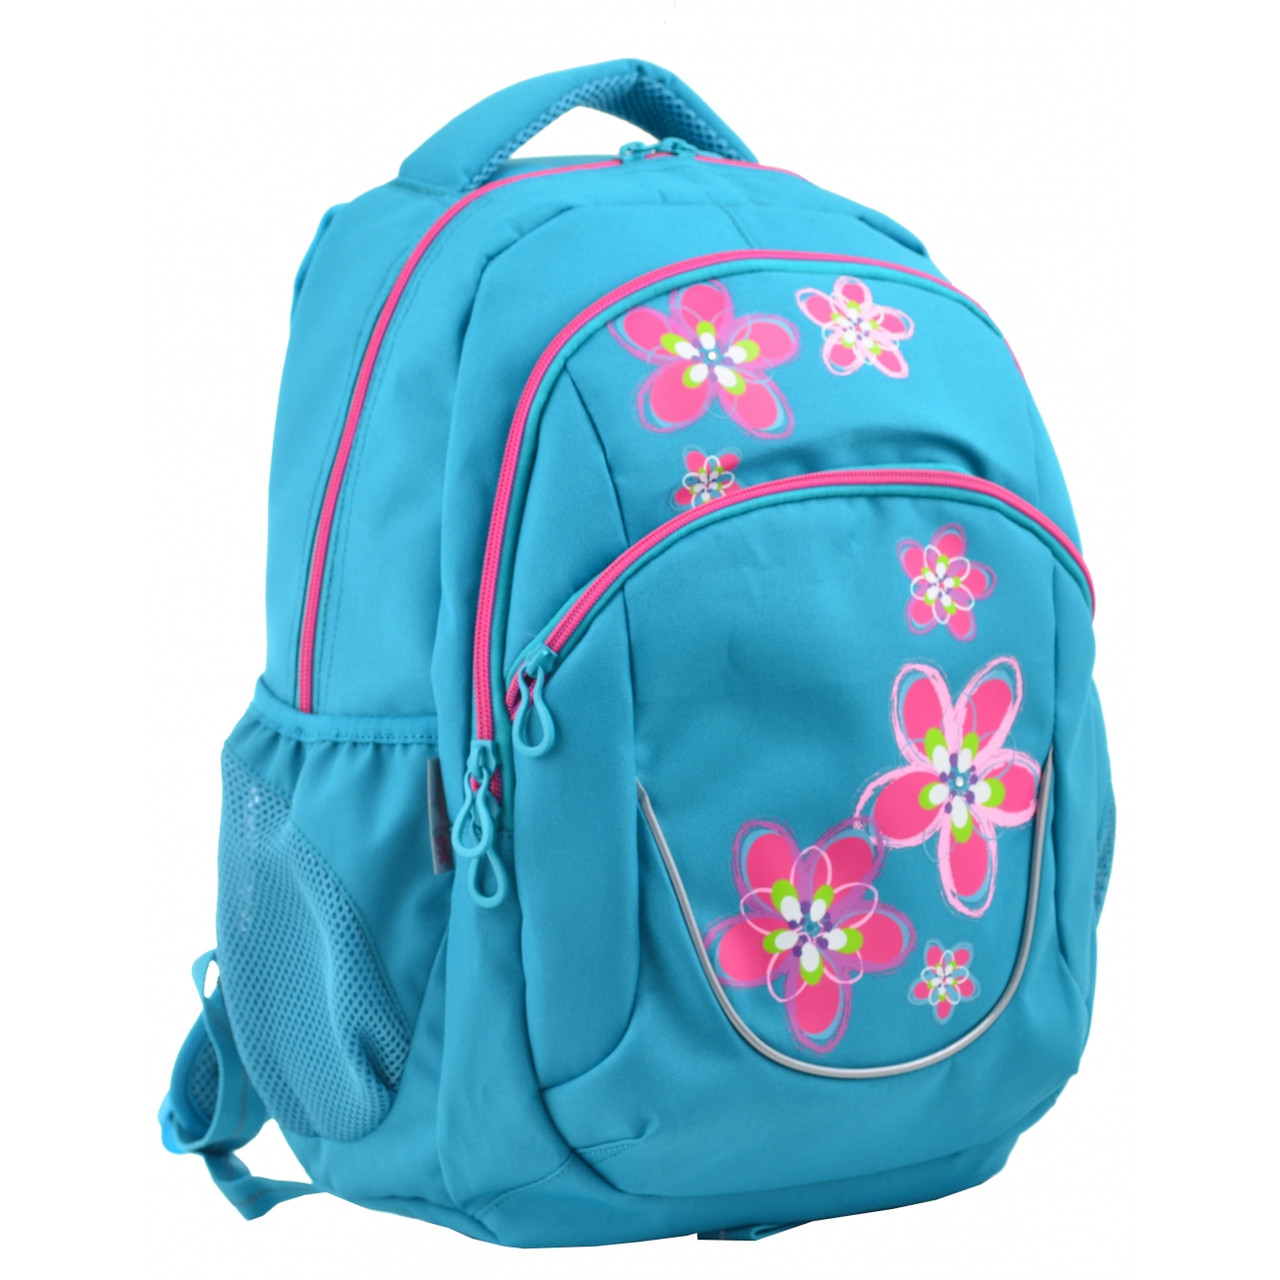 Рюкзак молодежный Т-45 Dreamy, 41*29*15